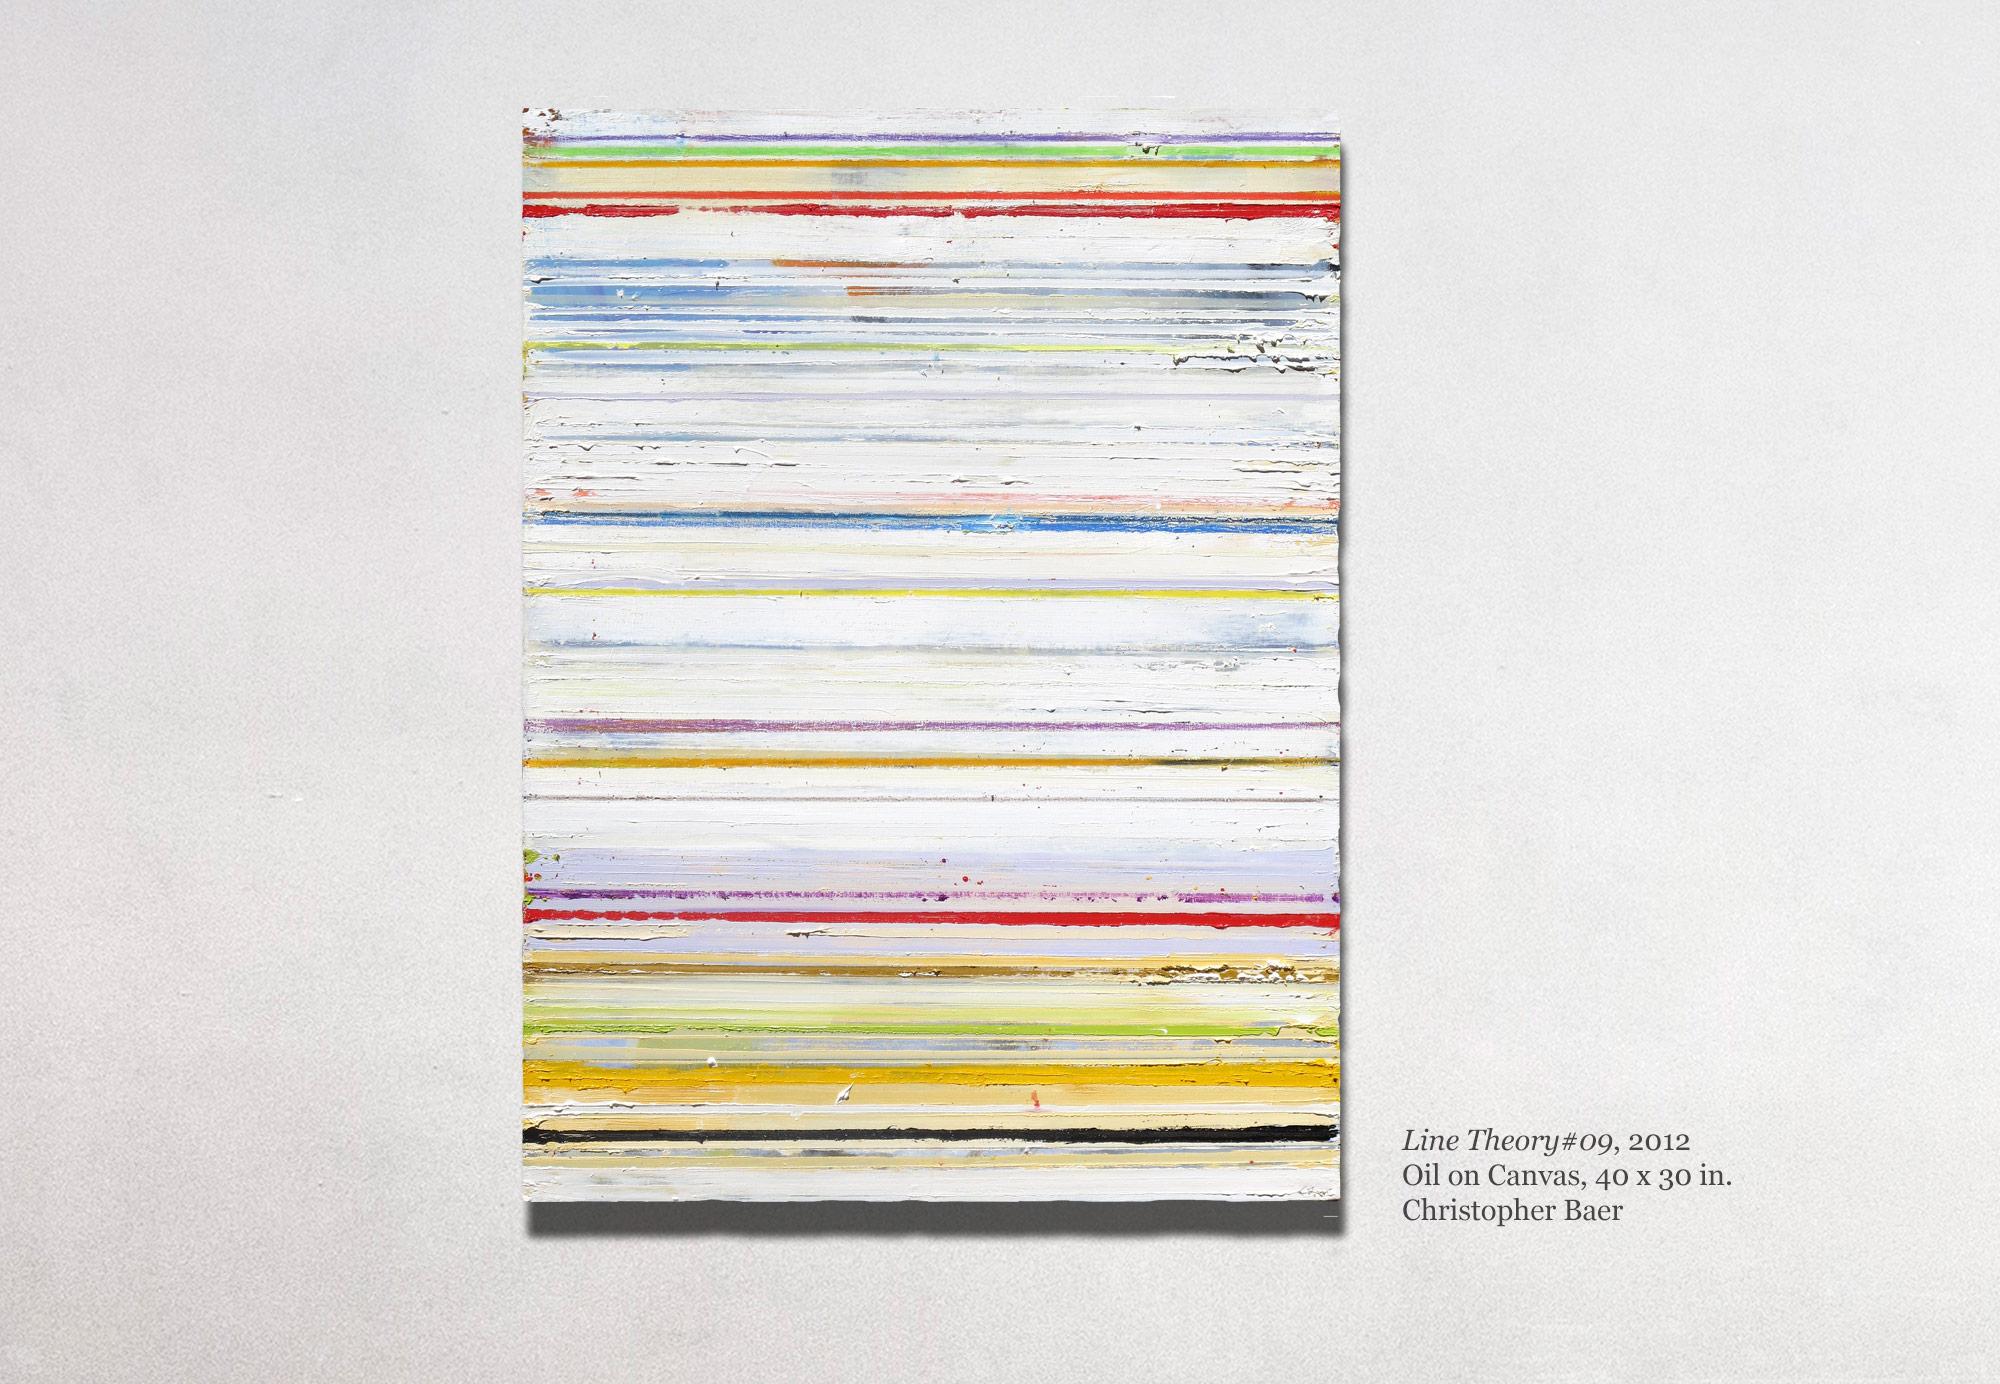 009.Line-Theory-40x30-2012-text.jpg